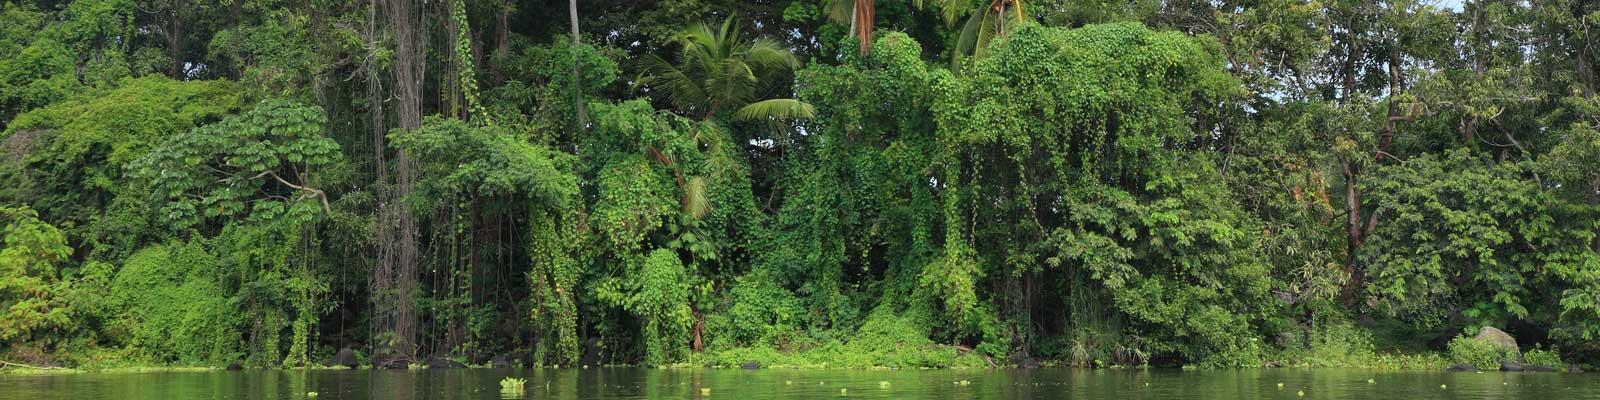 Nicaragua Lagos Florestas